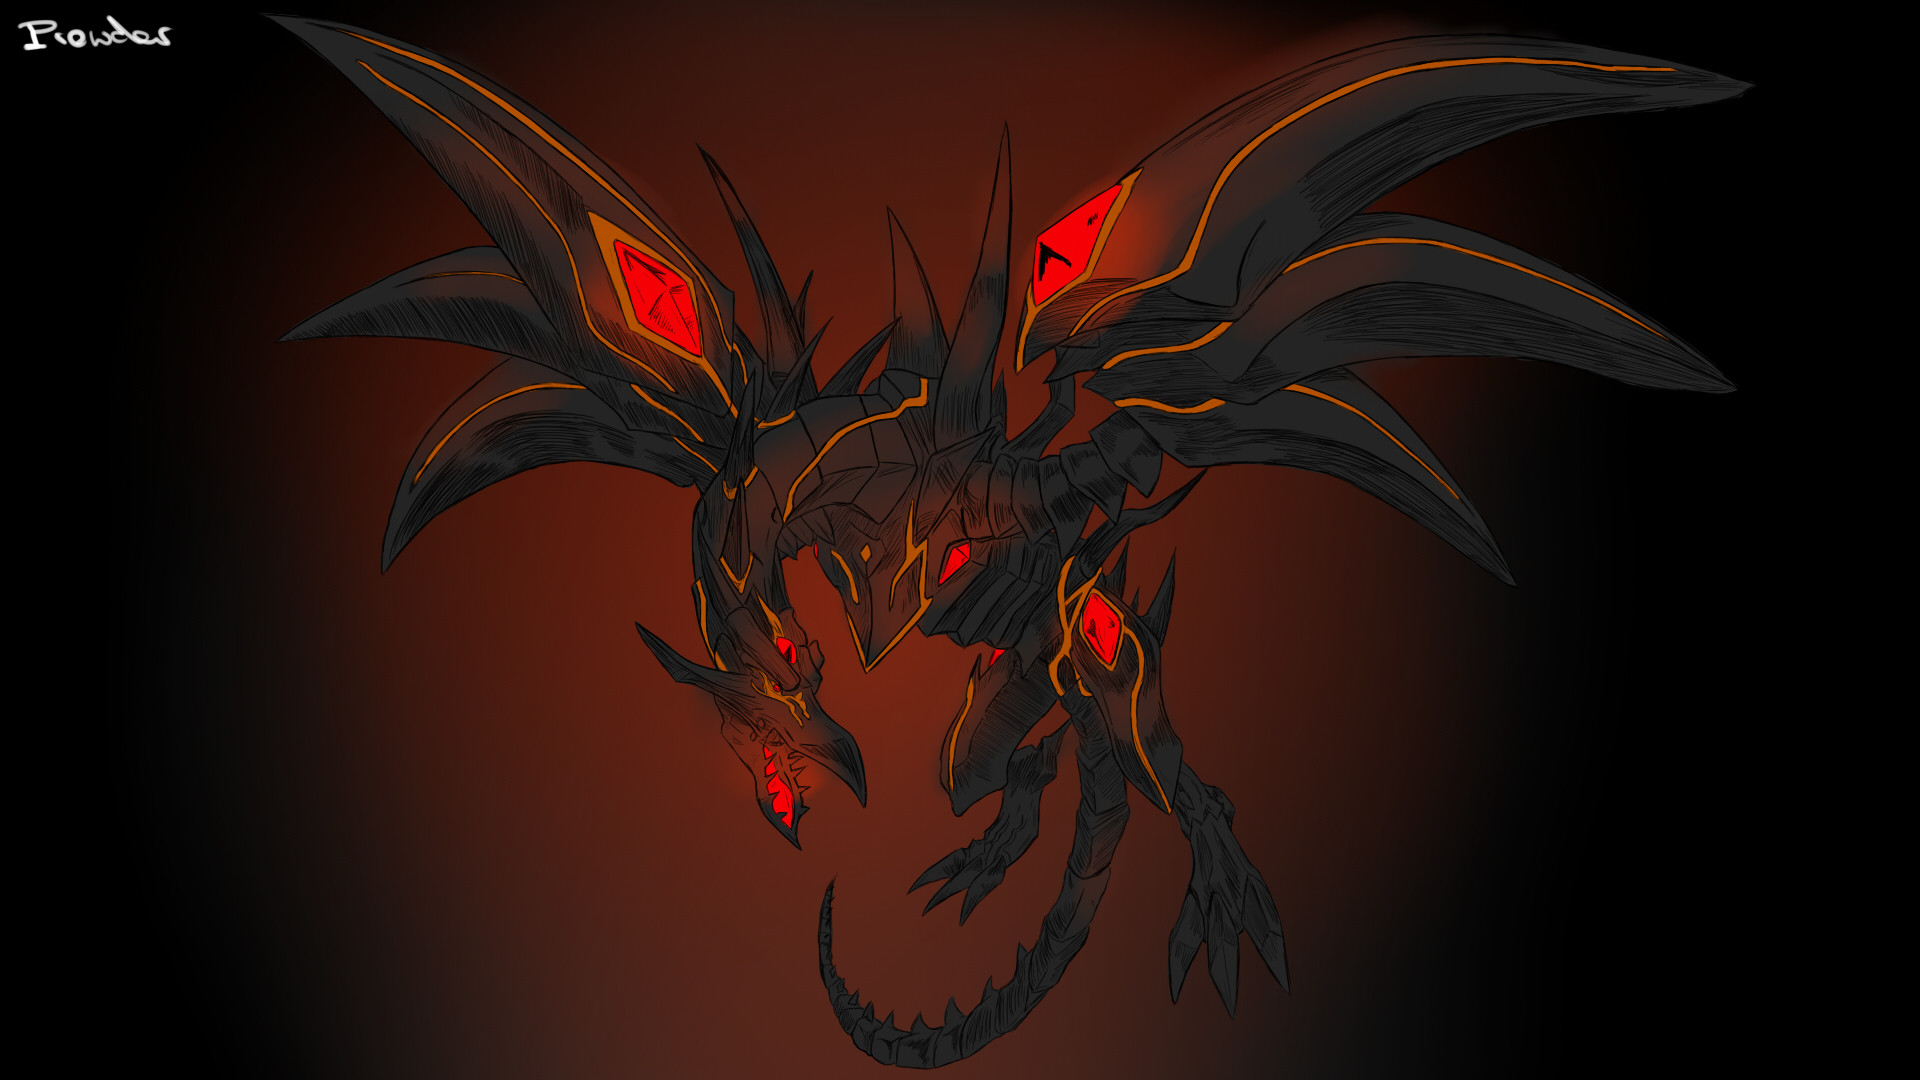 Yugioh Dragons Wallpaper Yu-gi-oh! dragons: red-eyes